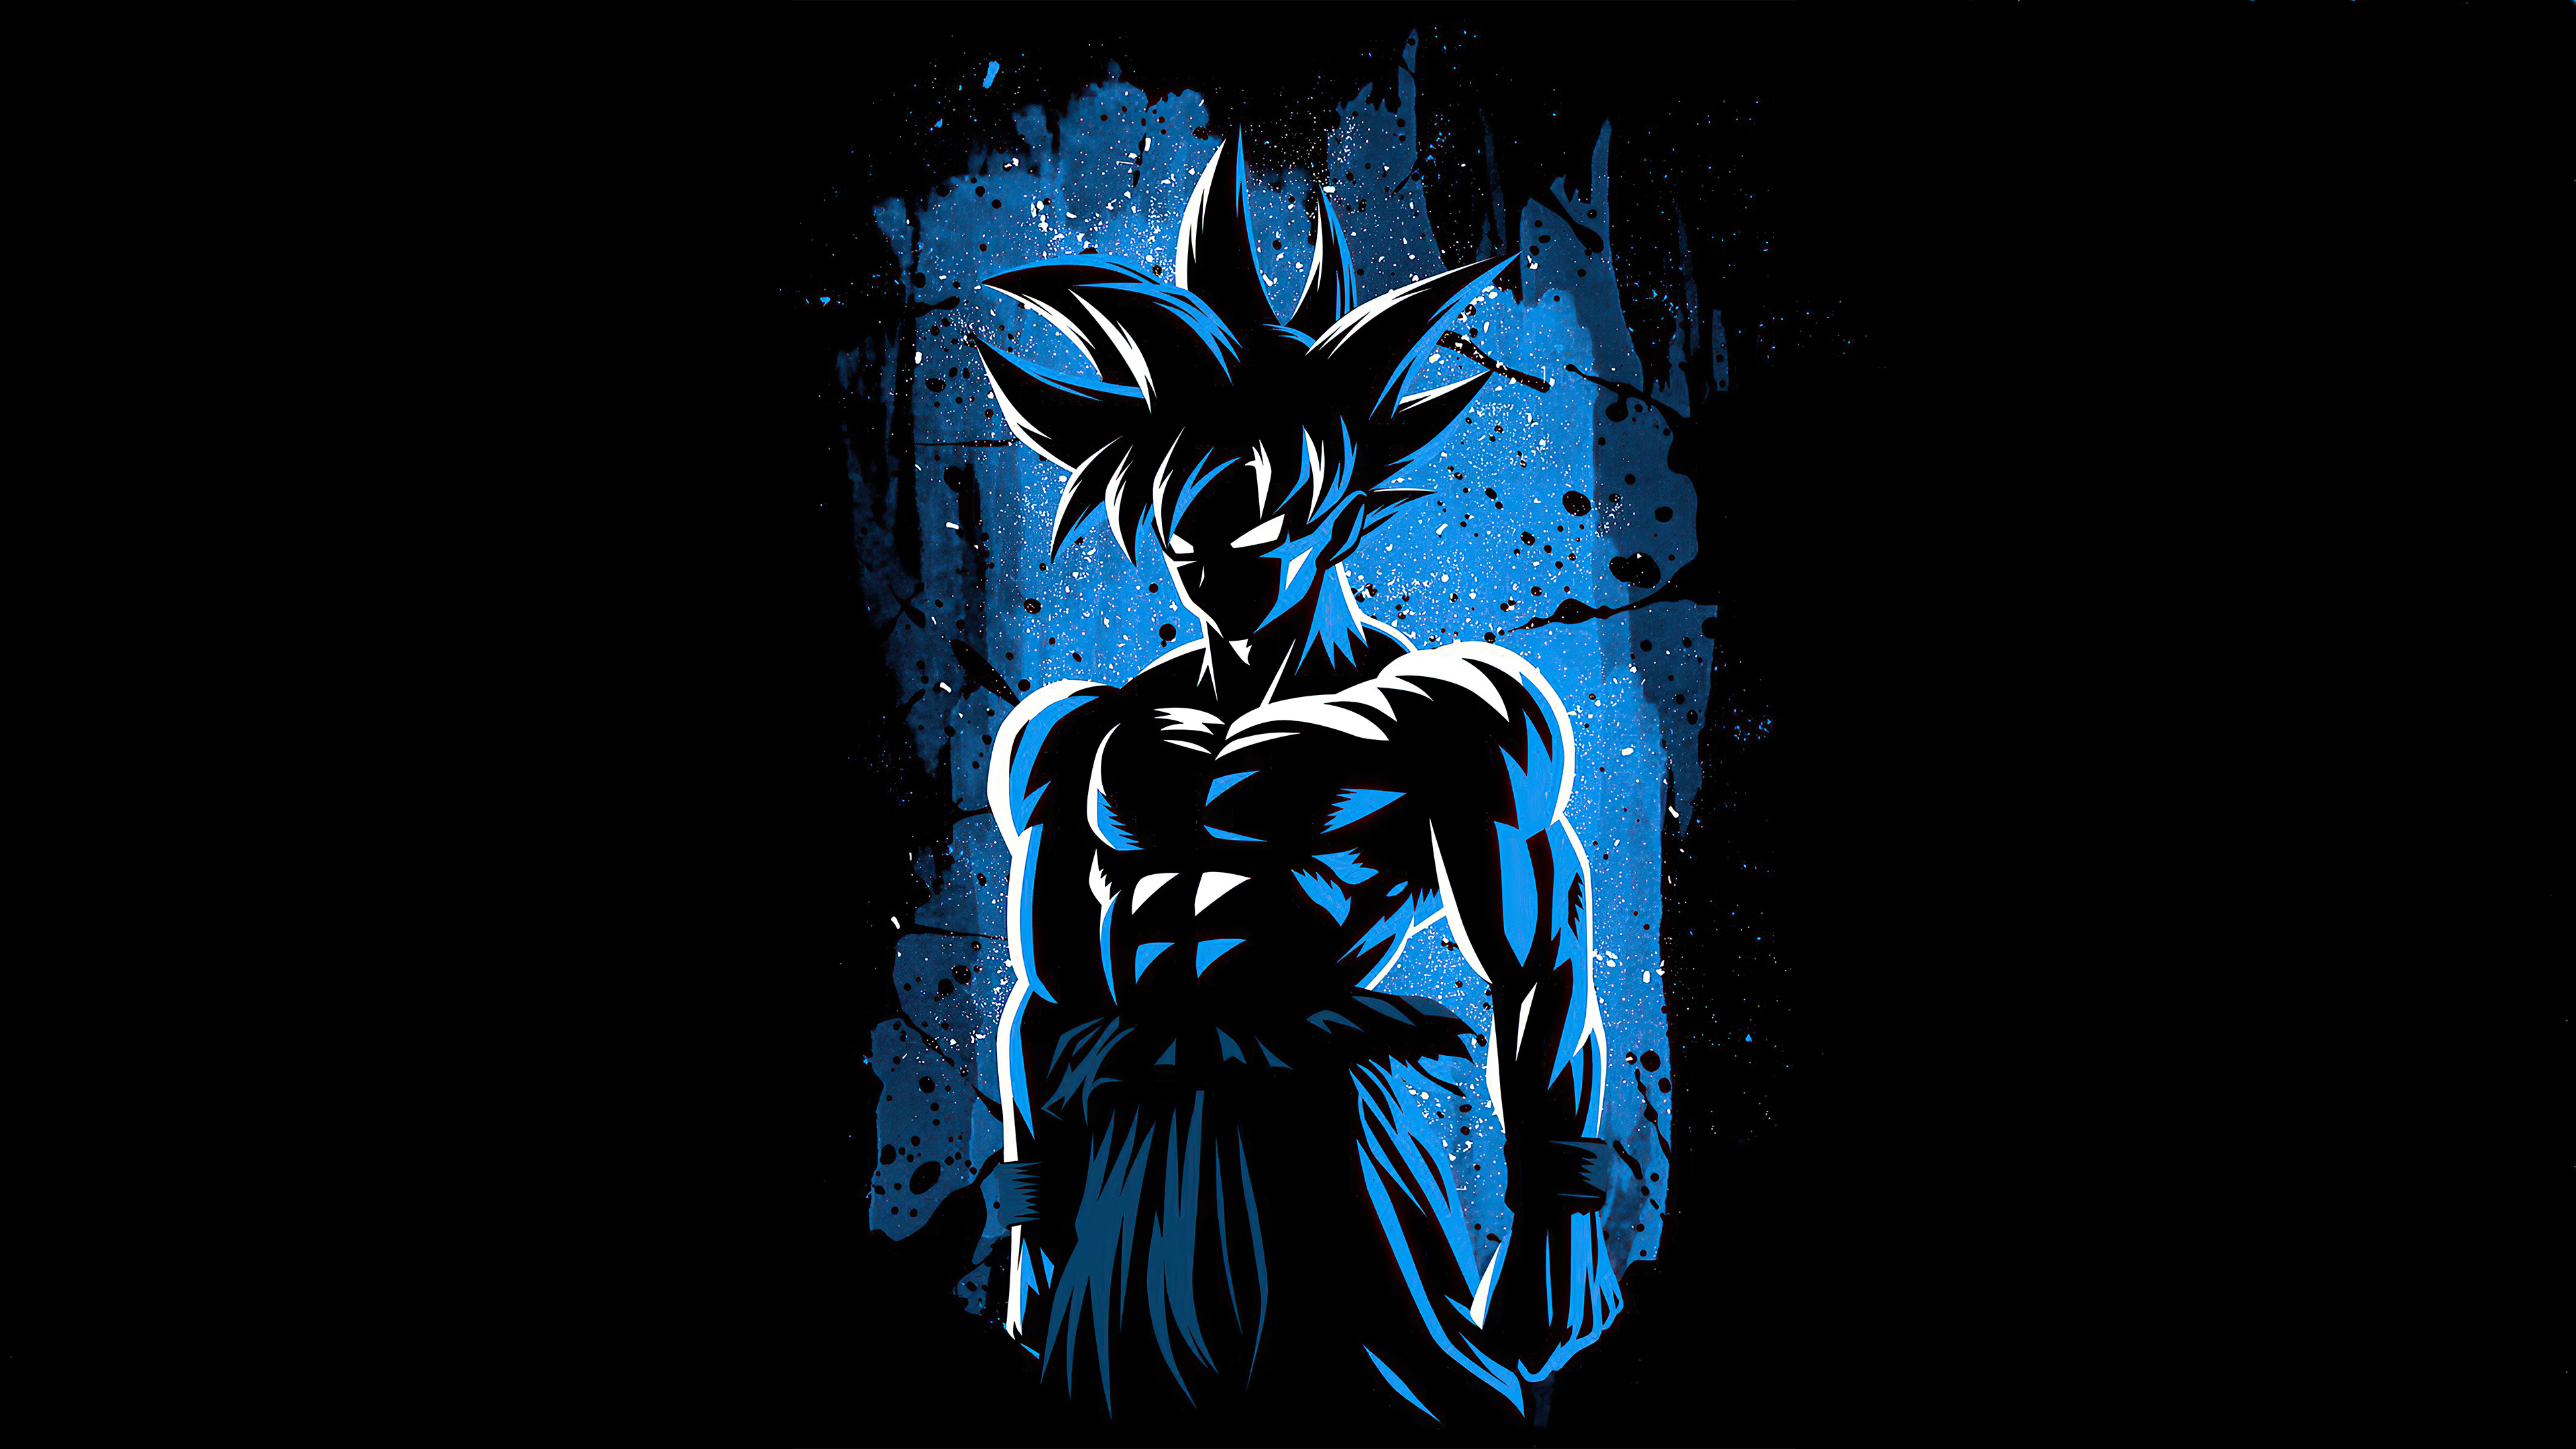 goku 2020 new 4k 1602437852 - Goku 2020 New 4k - Goku 2020 New 4k wallpapers